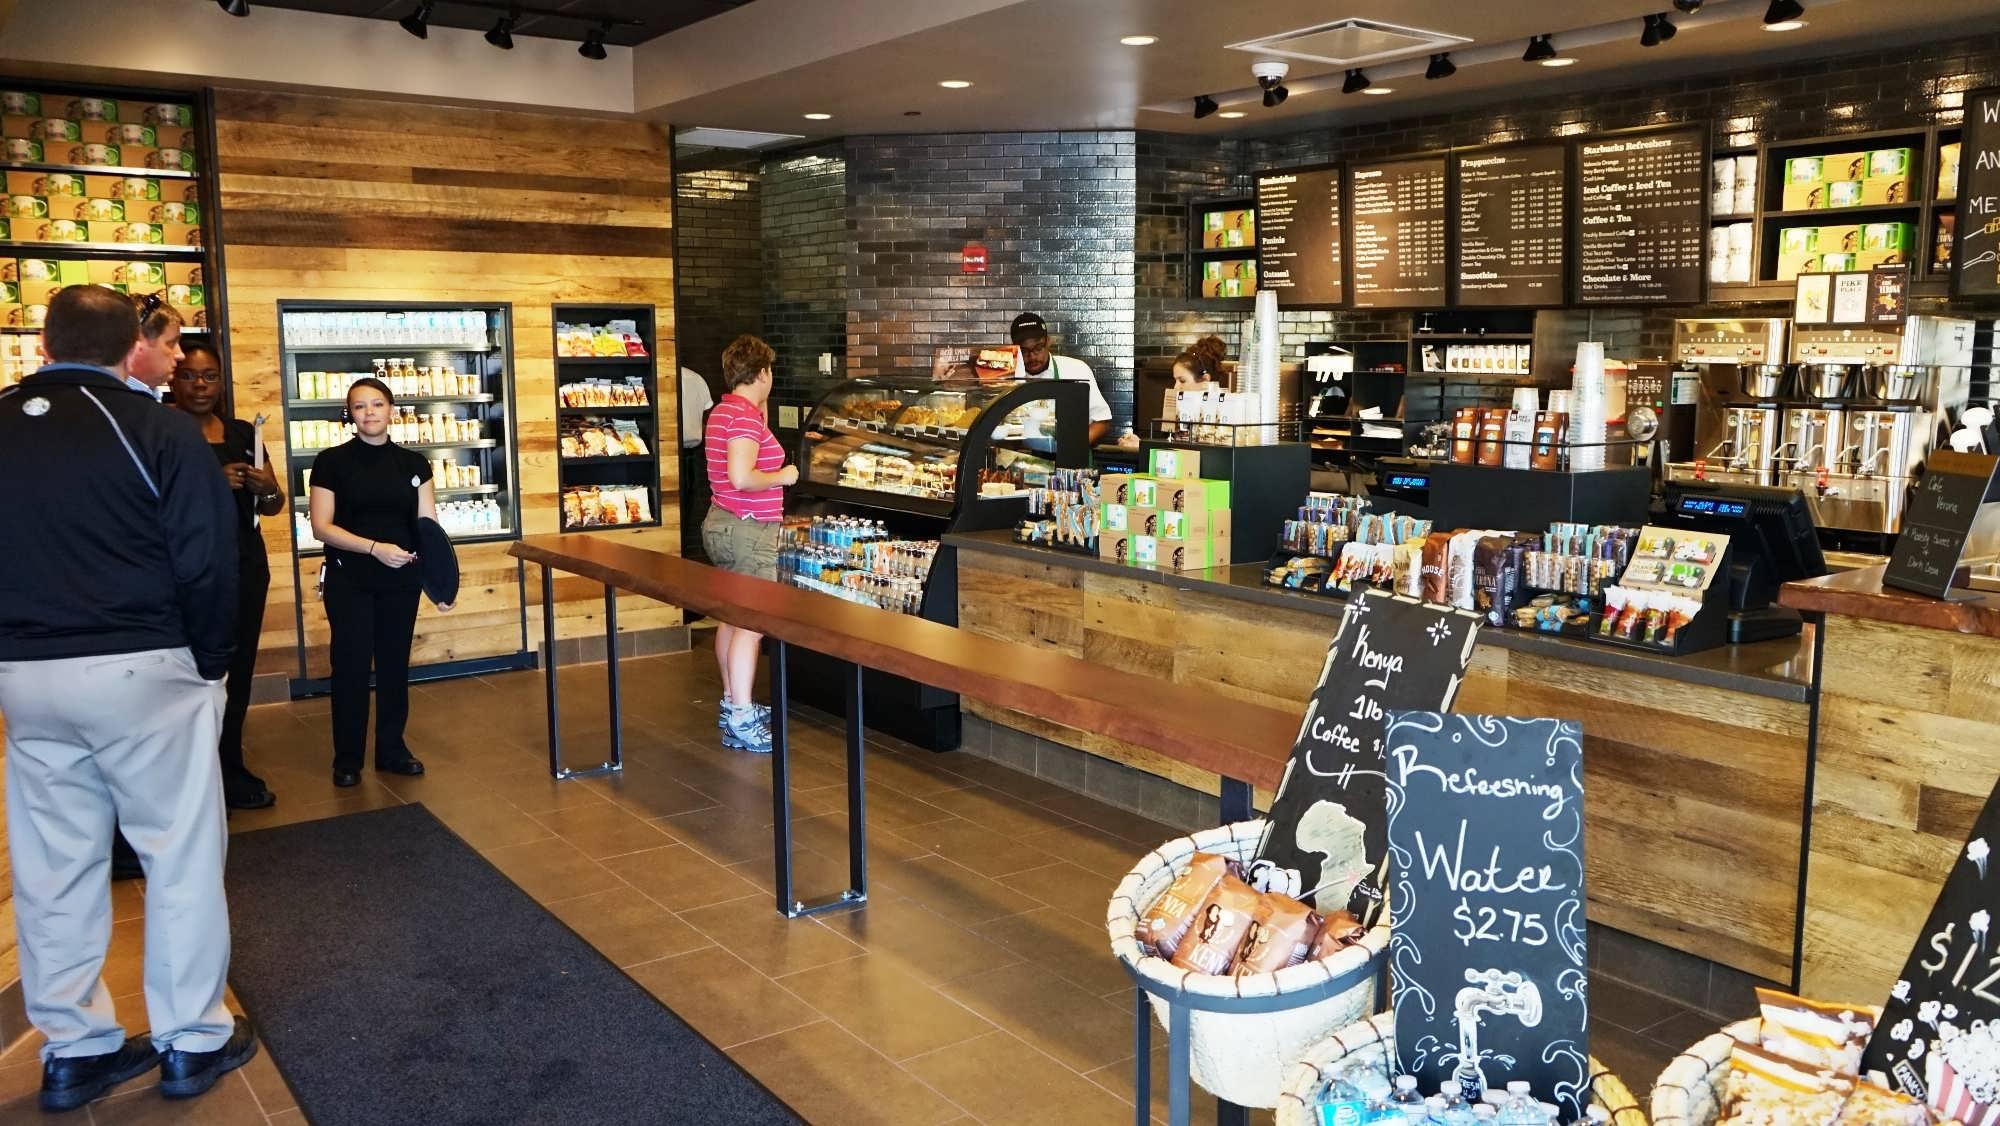 Starbucks at Universal's Islands of Adventure